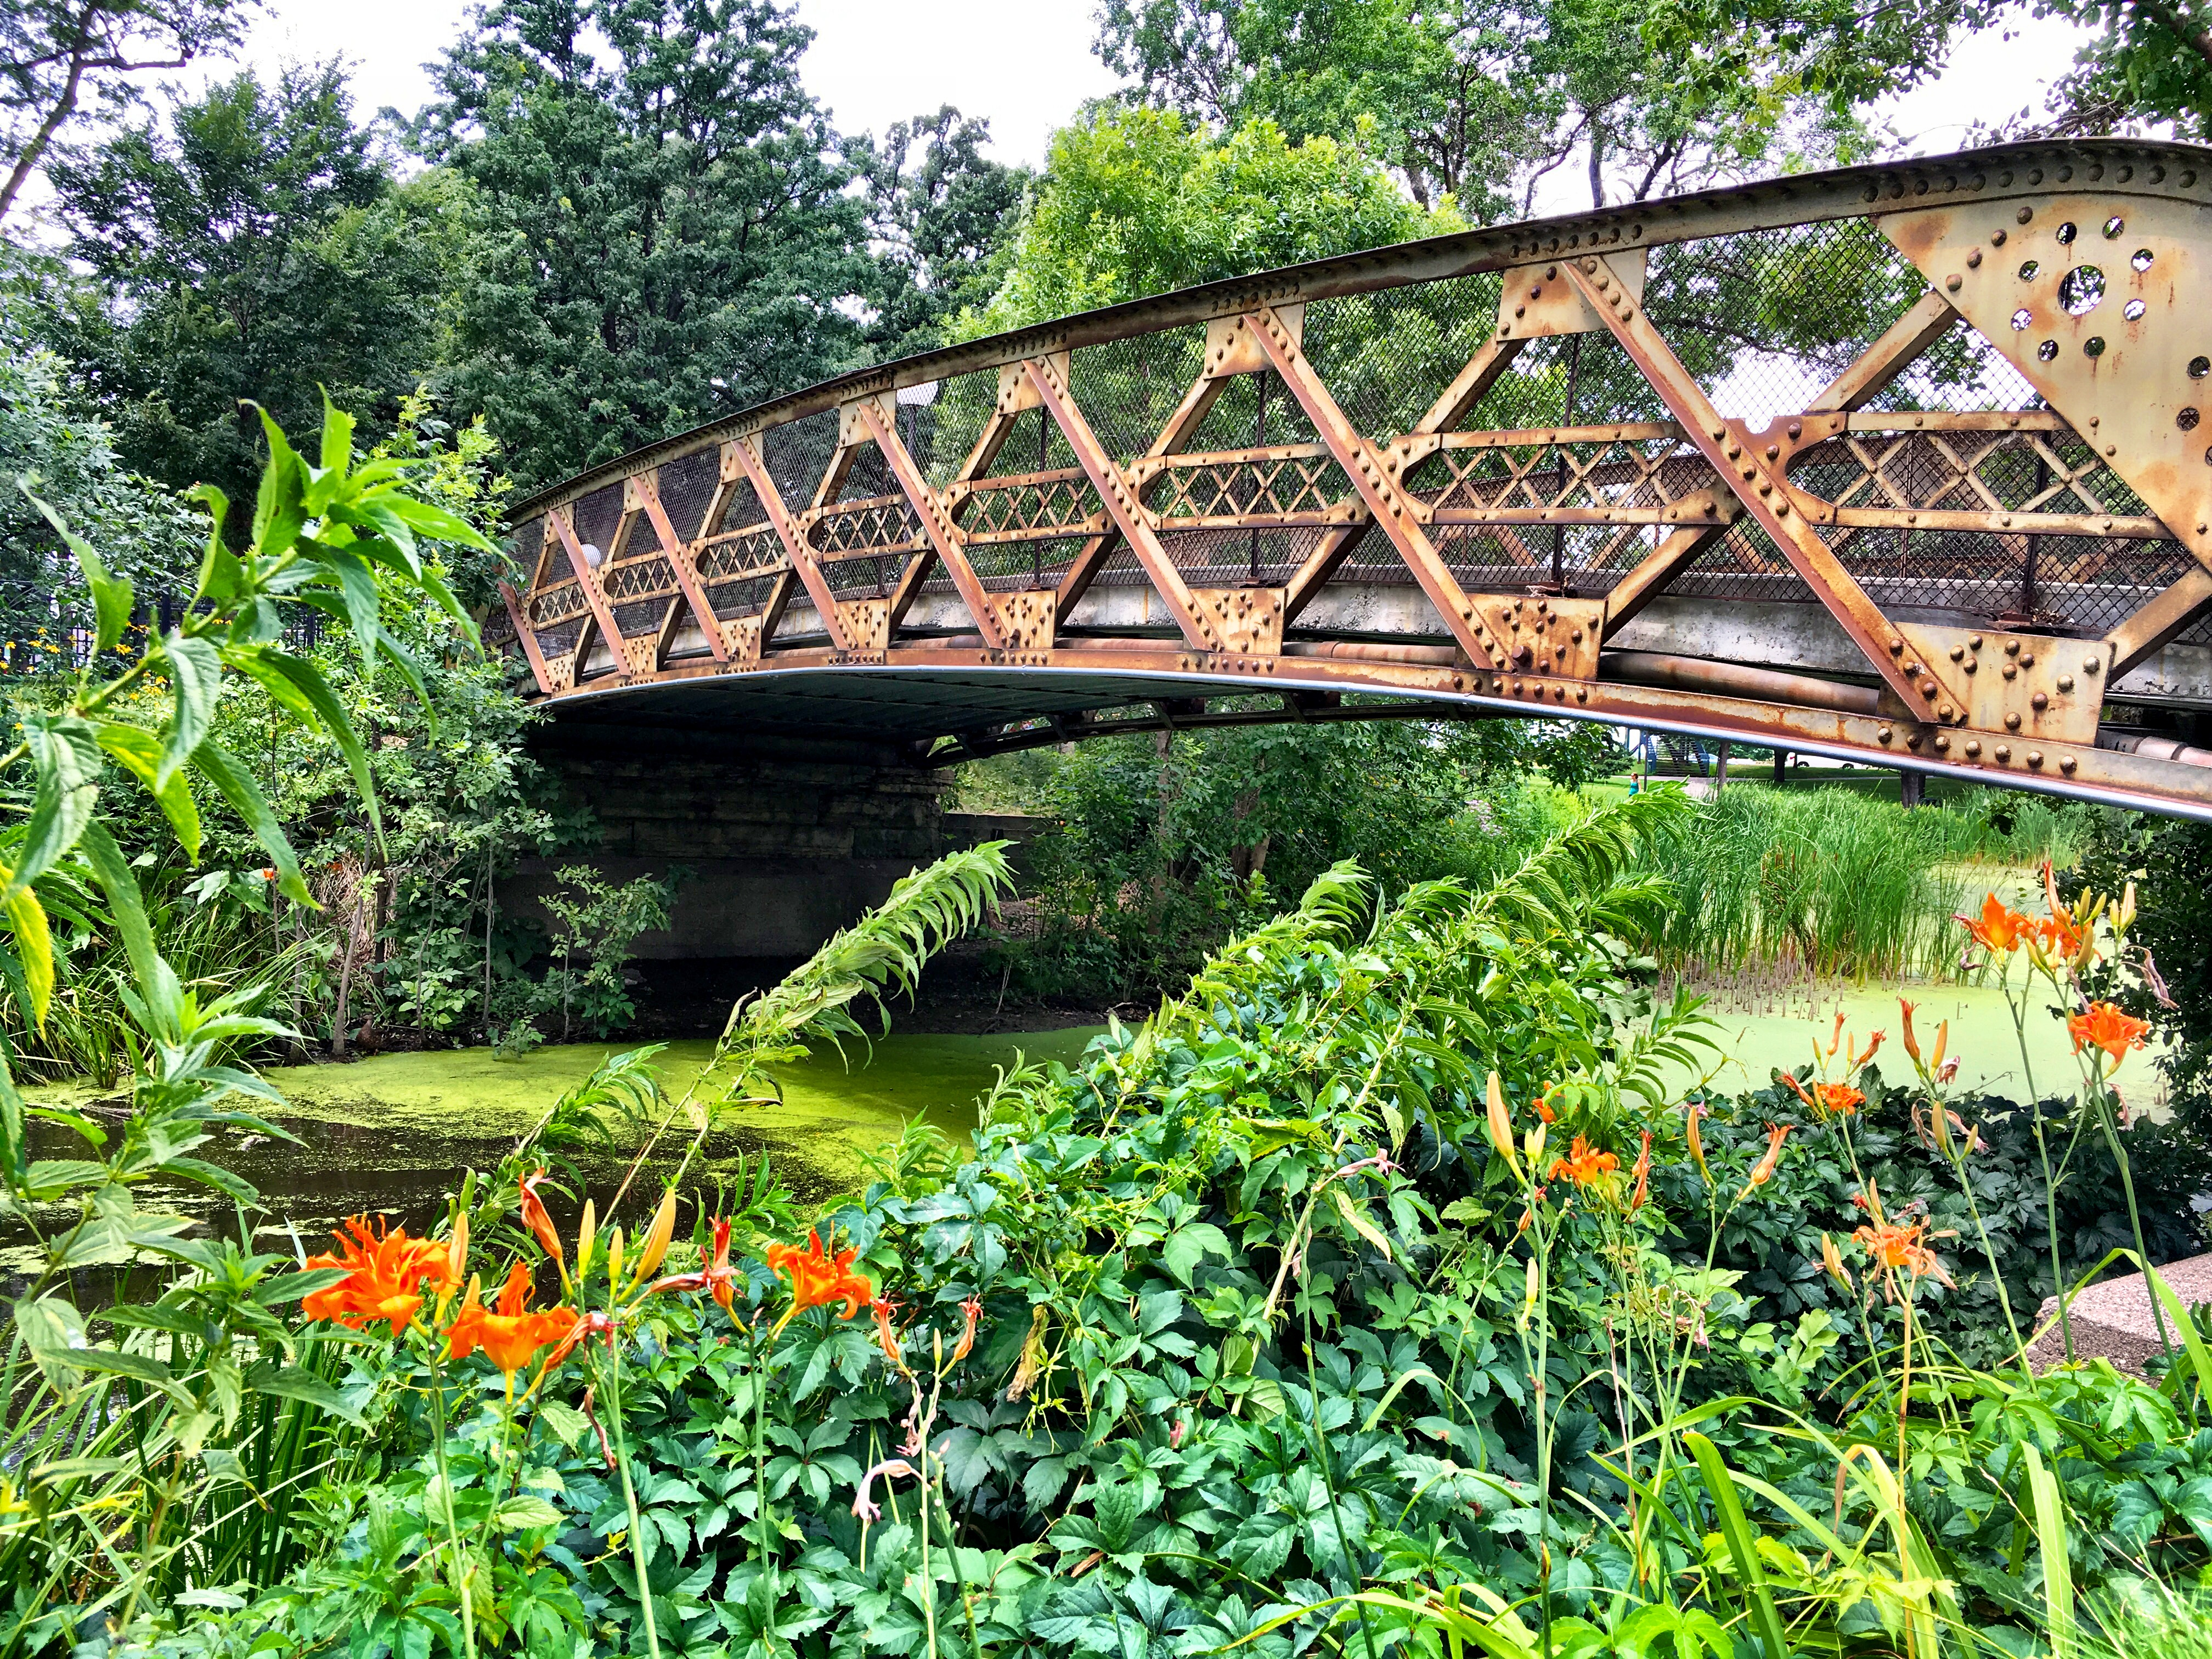 Short Bridge in Loring Park, Minneapolis